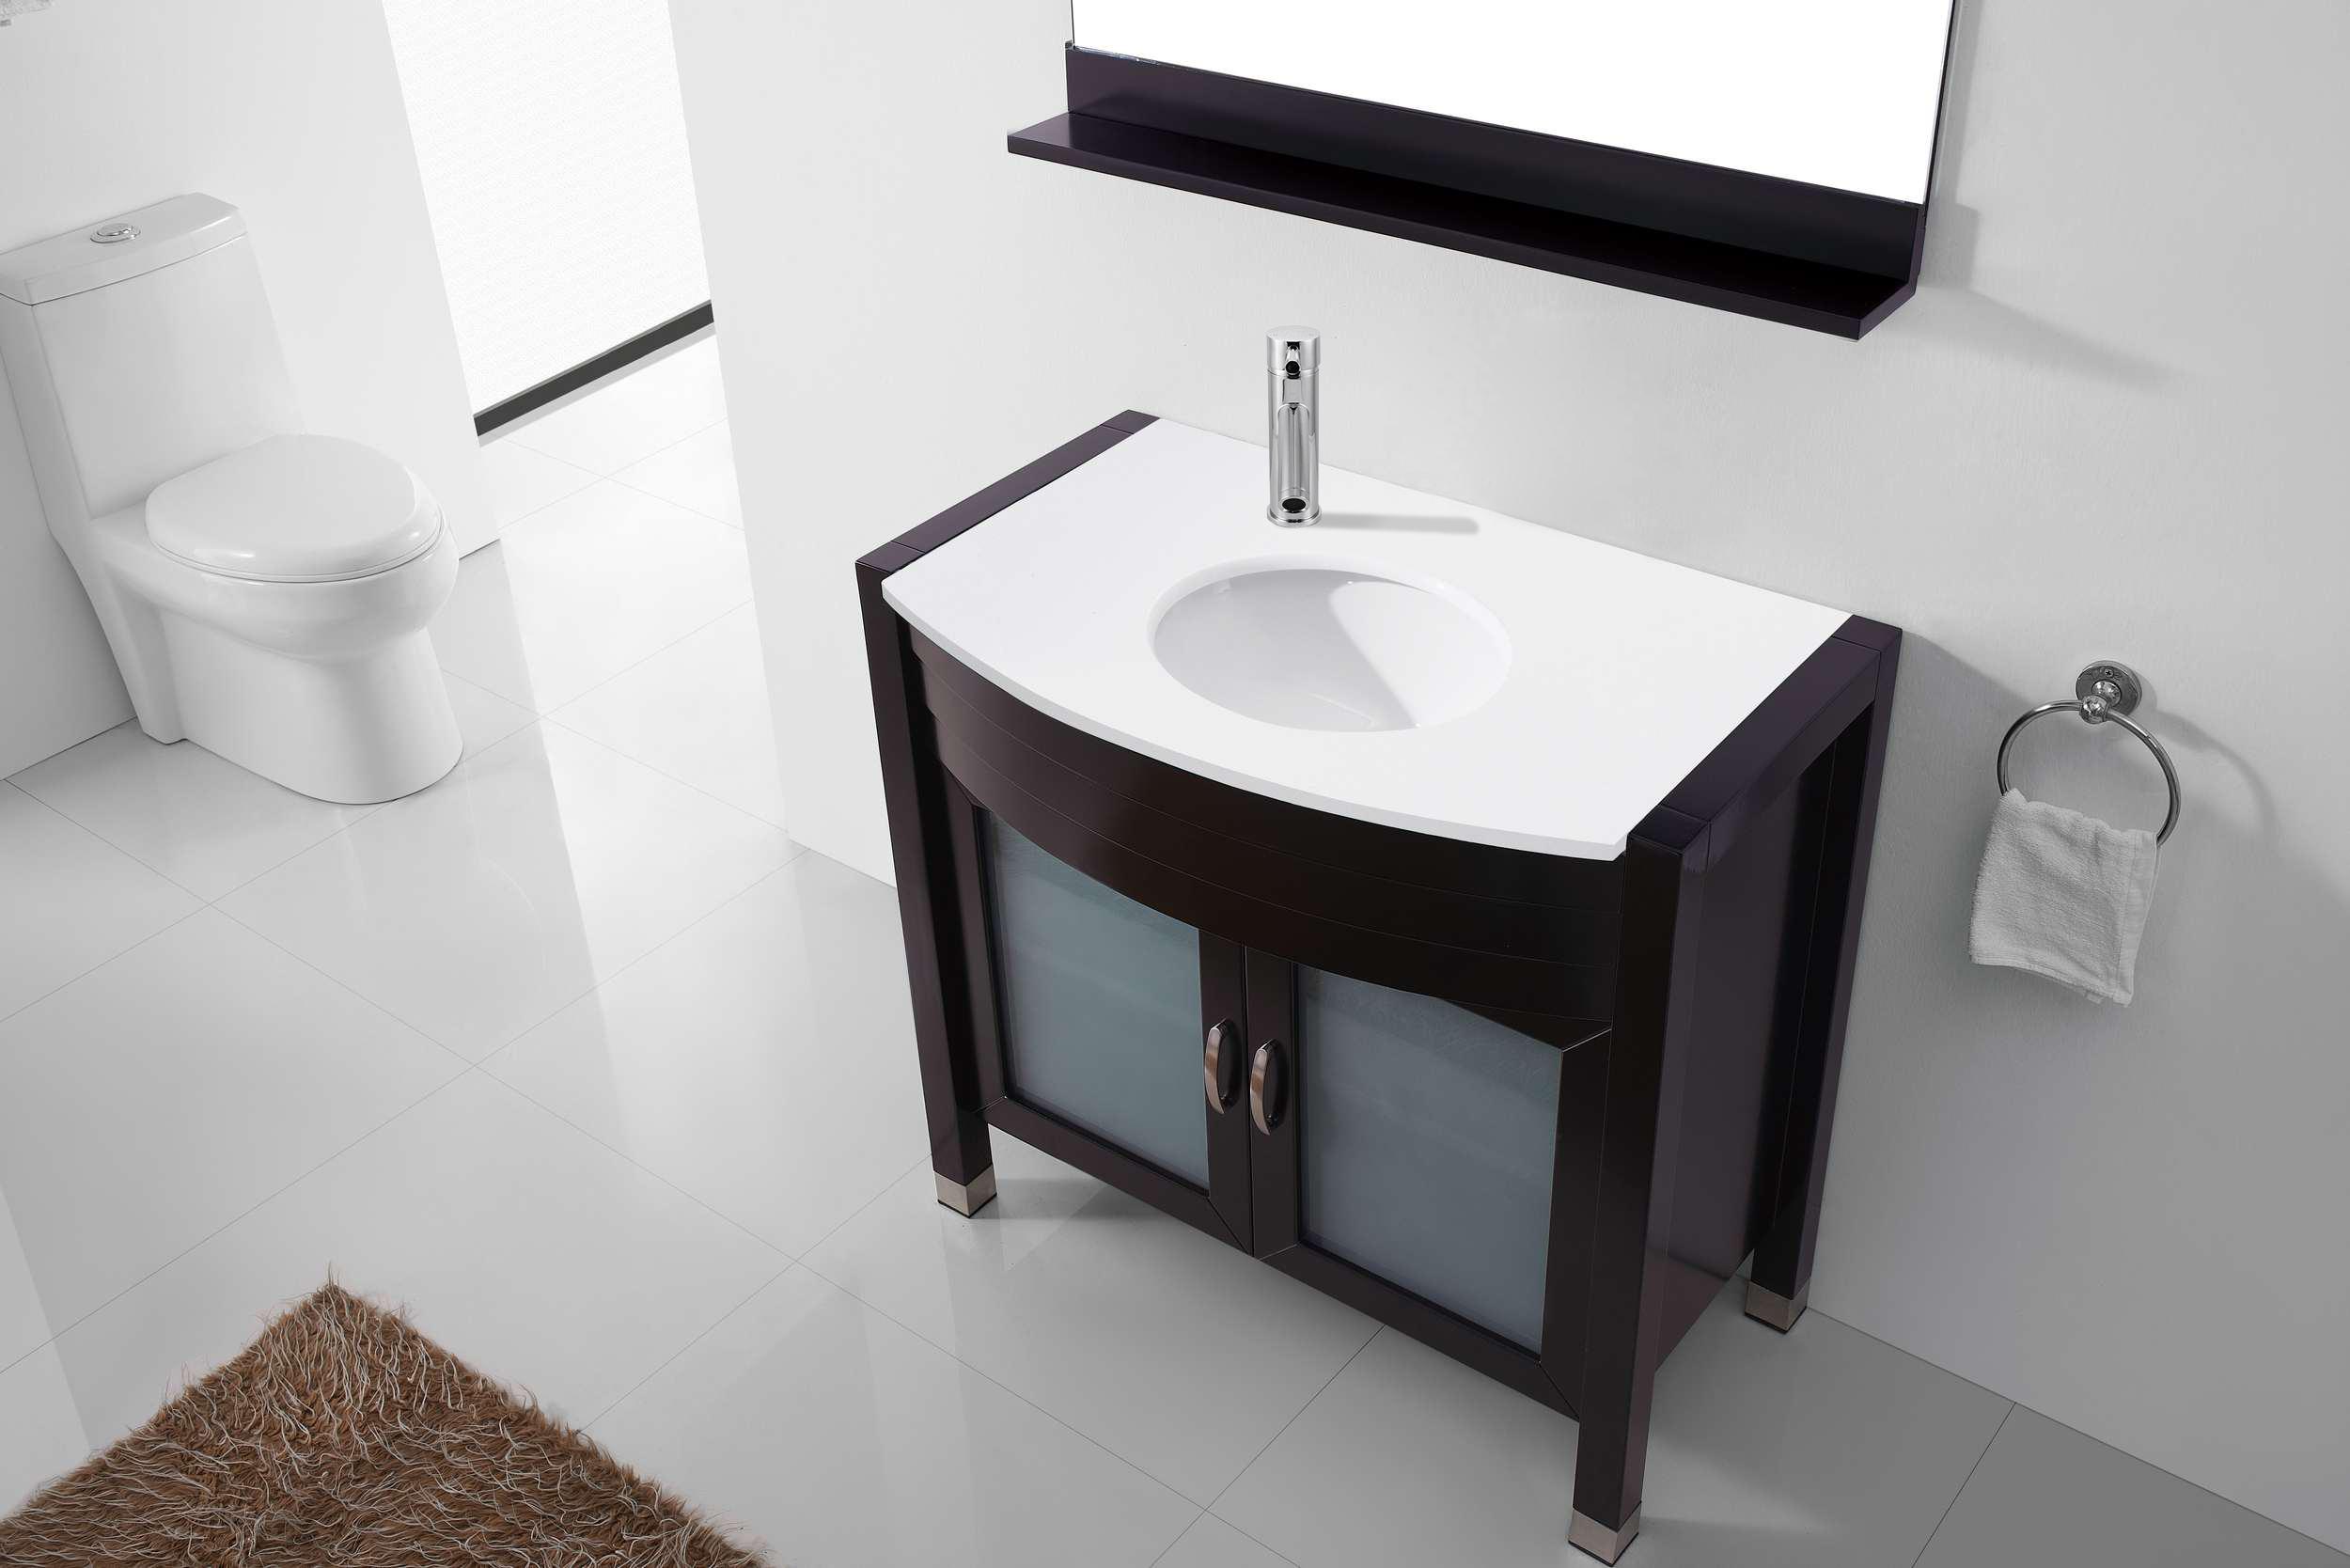 "Ava 36"" Vanity in Espresso by Virtu USA - um-3071-s-es-2"